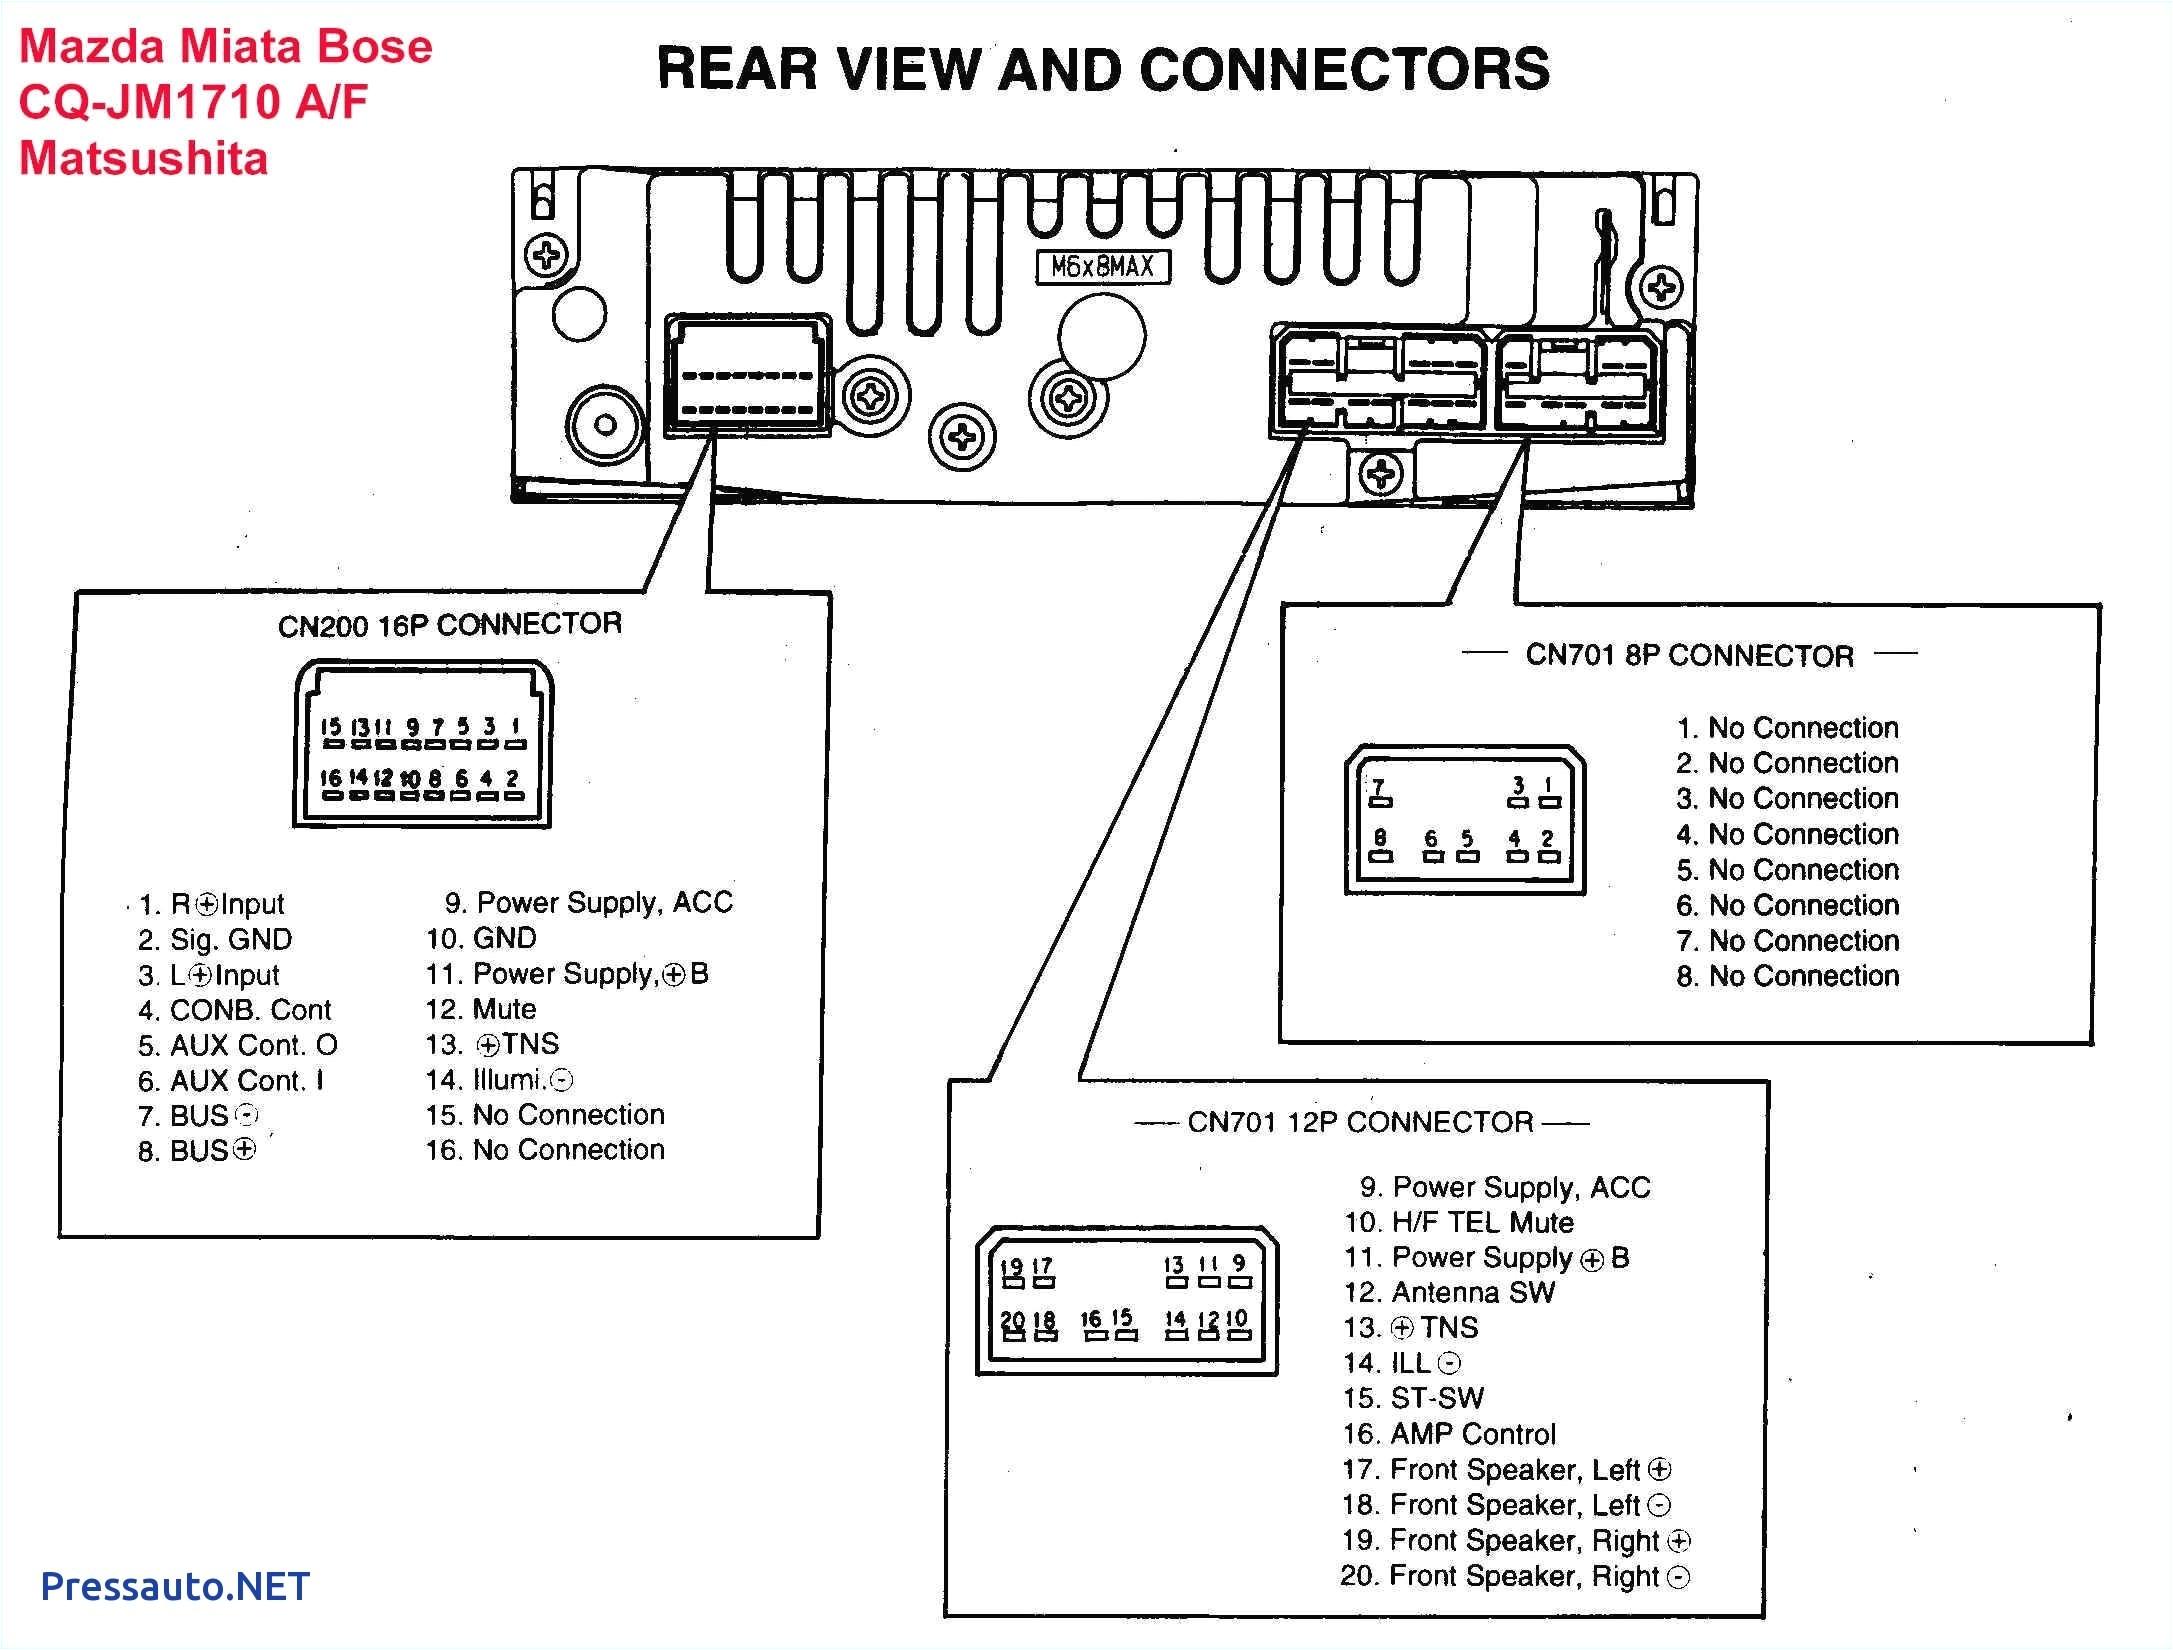 vr6 engine diagram wwwtyrolsportcom maintenance vr6timing toyota fujitsu ten 86120 wiring diagram fujitsu ten wiring diagram source toyota car stereo